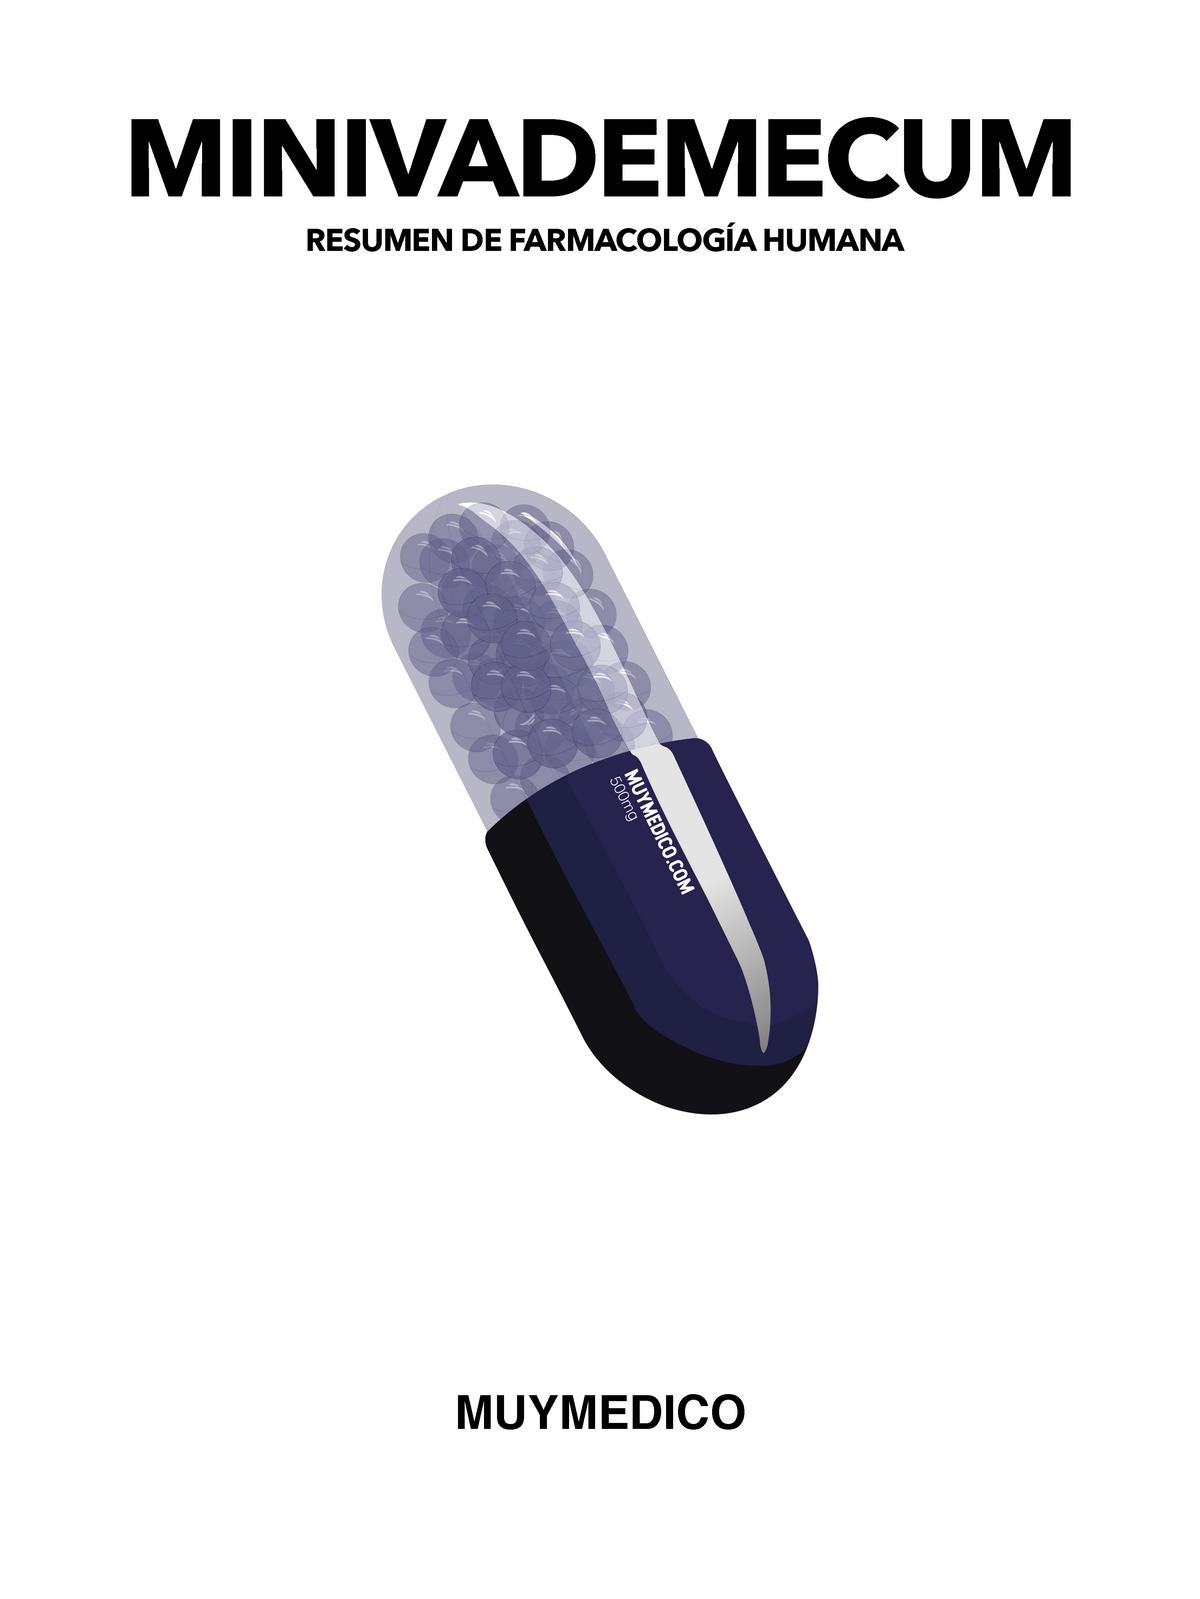 Farmacologico tina inguinal tratamiento